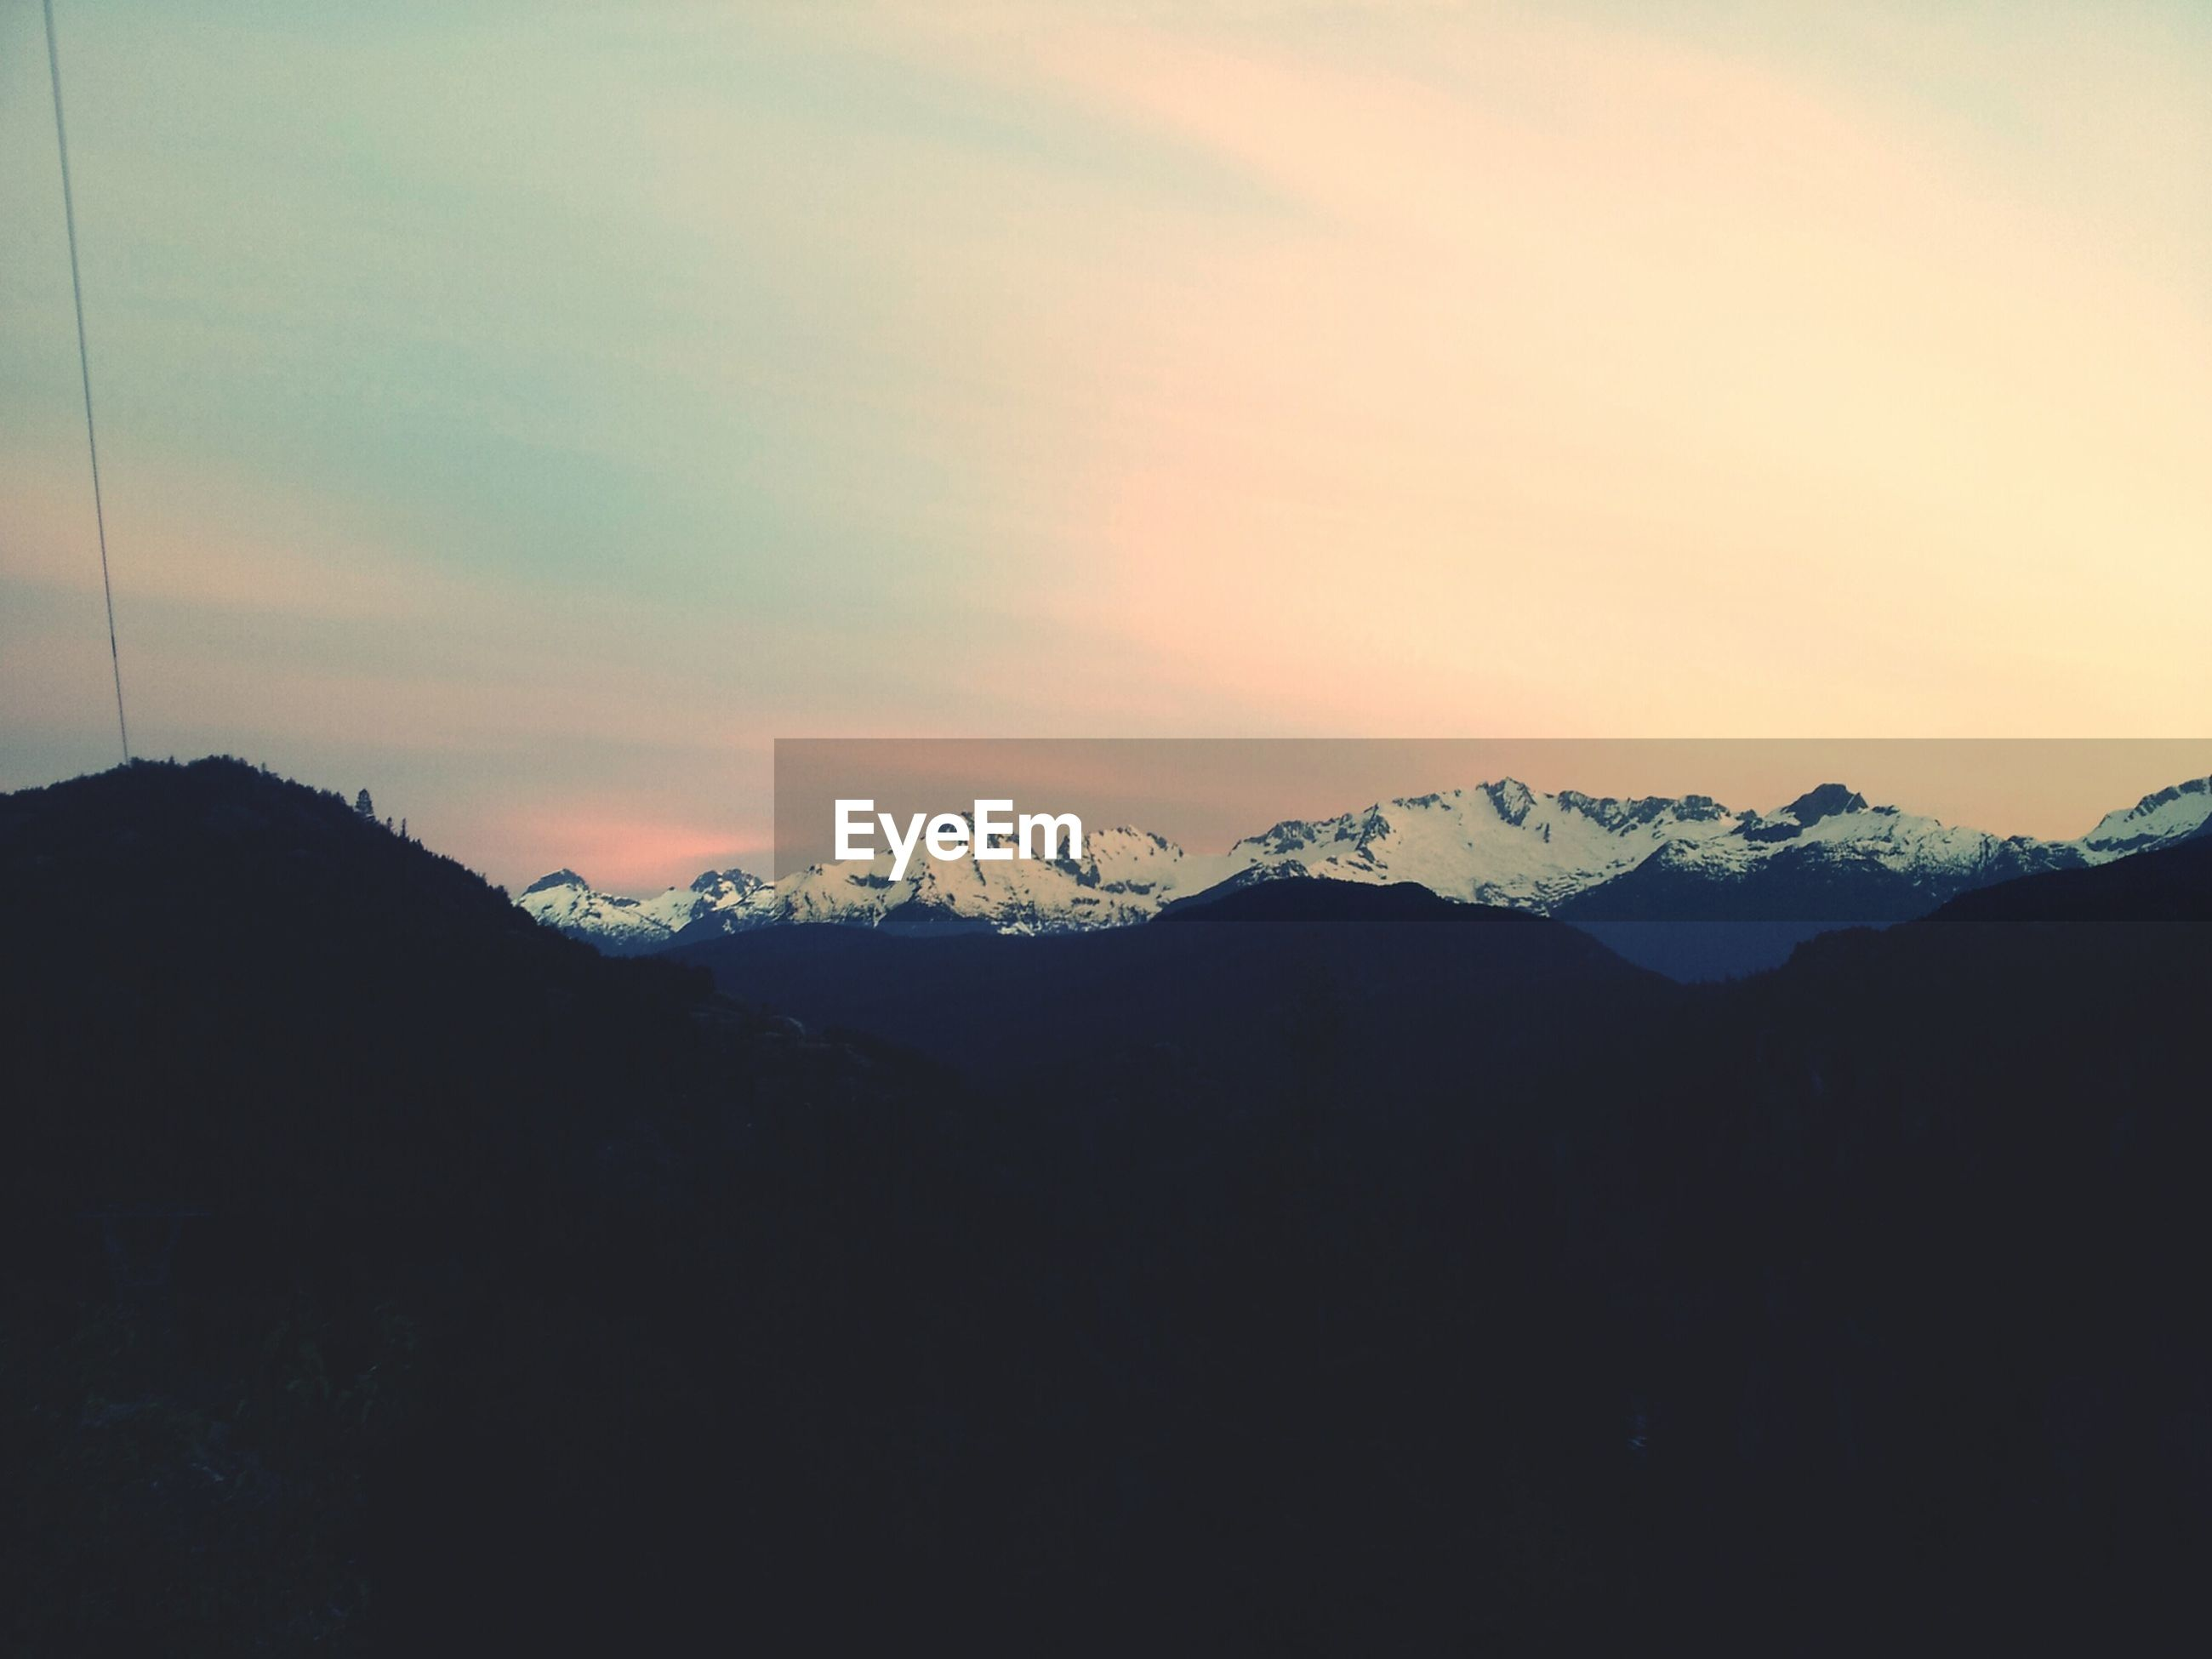 mountain, sunset, scenics, tranquil scene, tranquility, mountain range, silhouette, beauty in nature, sky, nature, landscape, winter, idyllic, orange color, snow, cold temperature, weather, dusk, copy space, cloud - sky